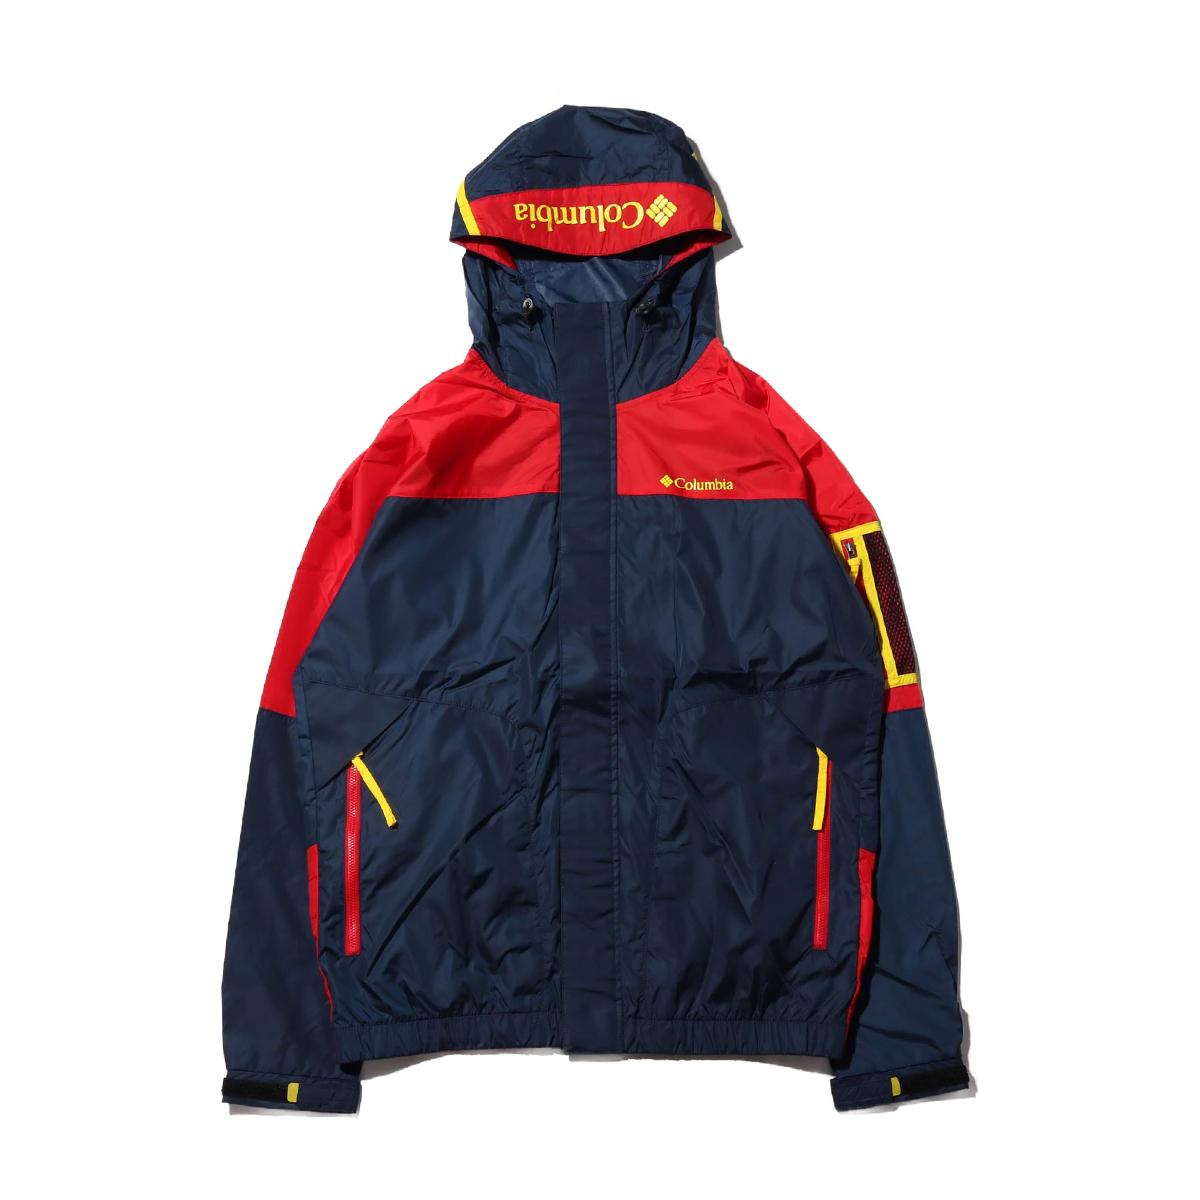 Columbia Pavlof Road Jacket (コロンビア パブロフ ロード ジャケット)MOUNTAIN RED【メンズ ジャケット】19SP-I